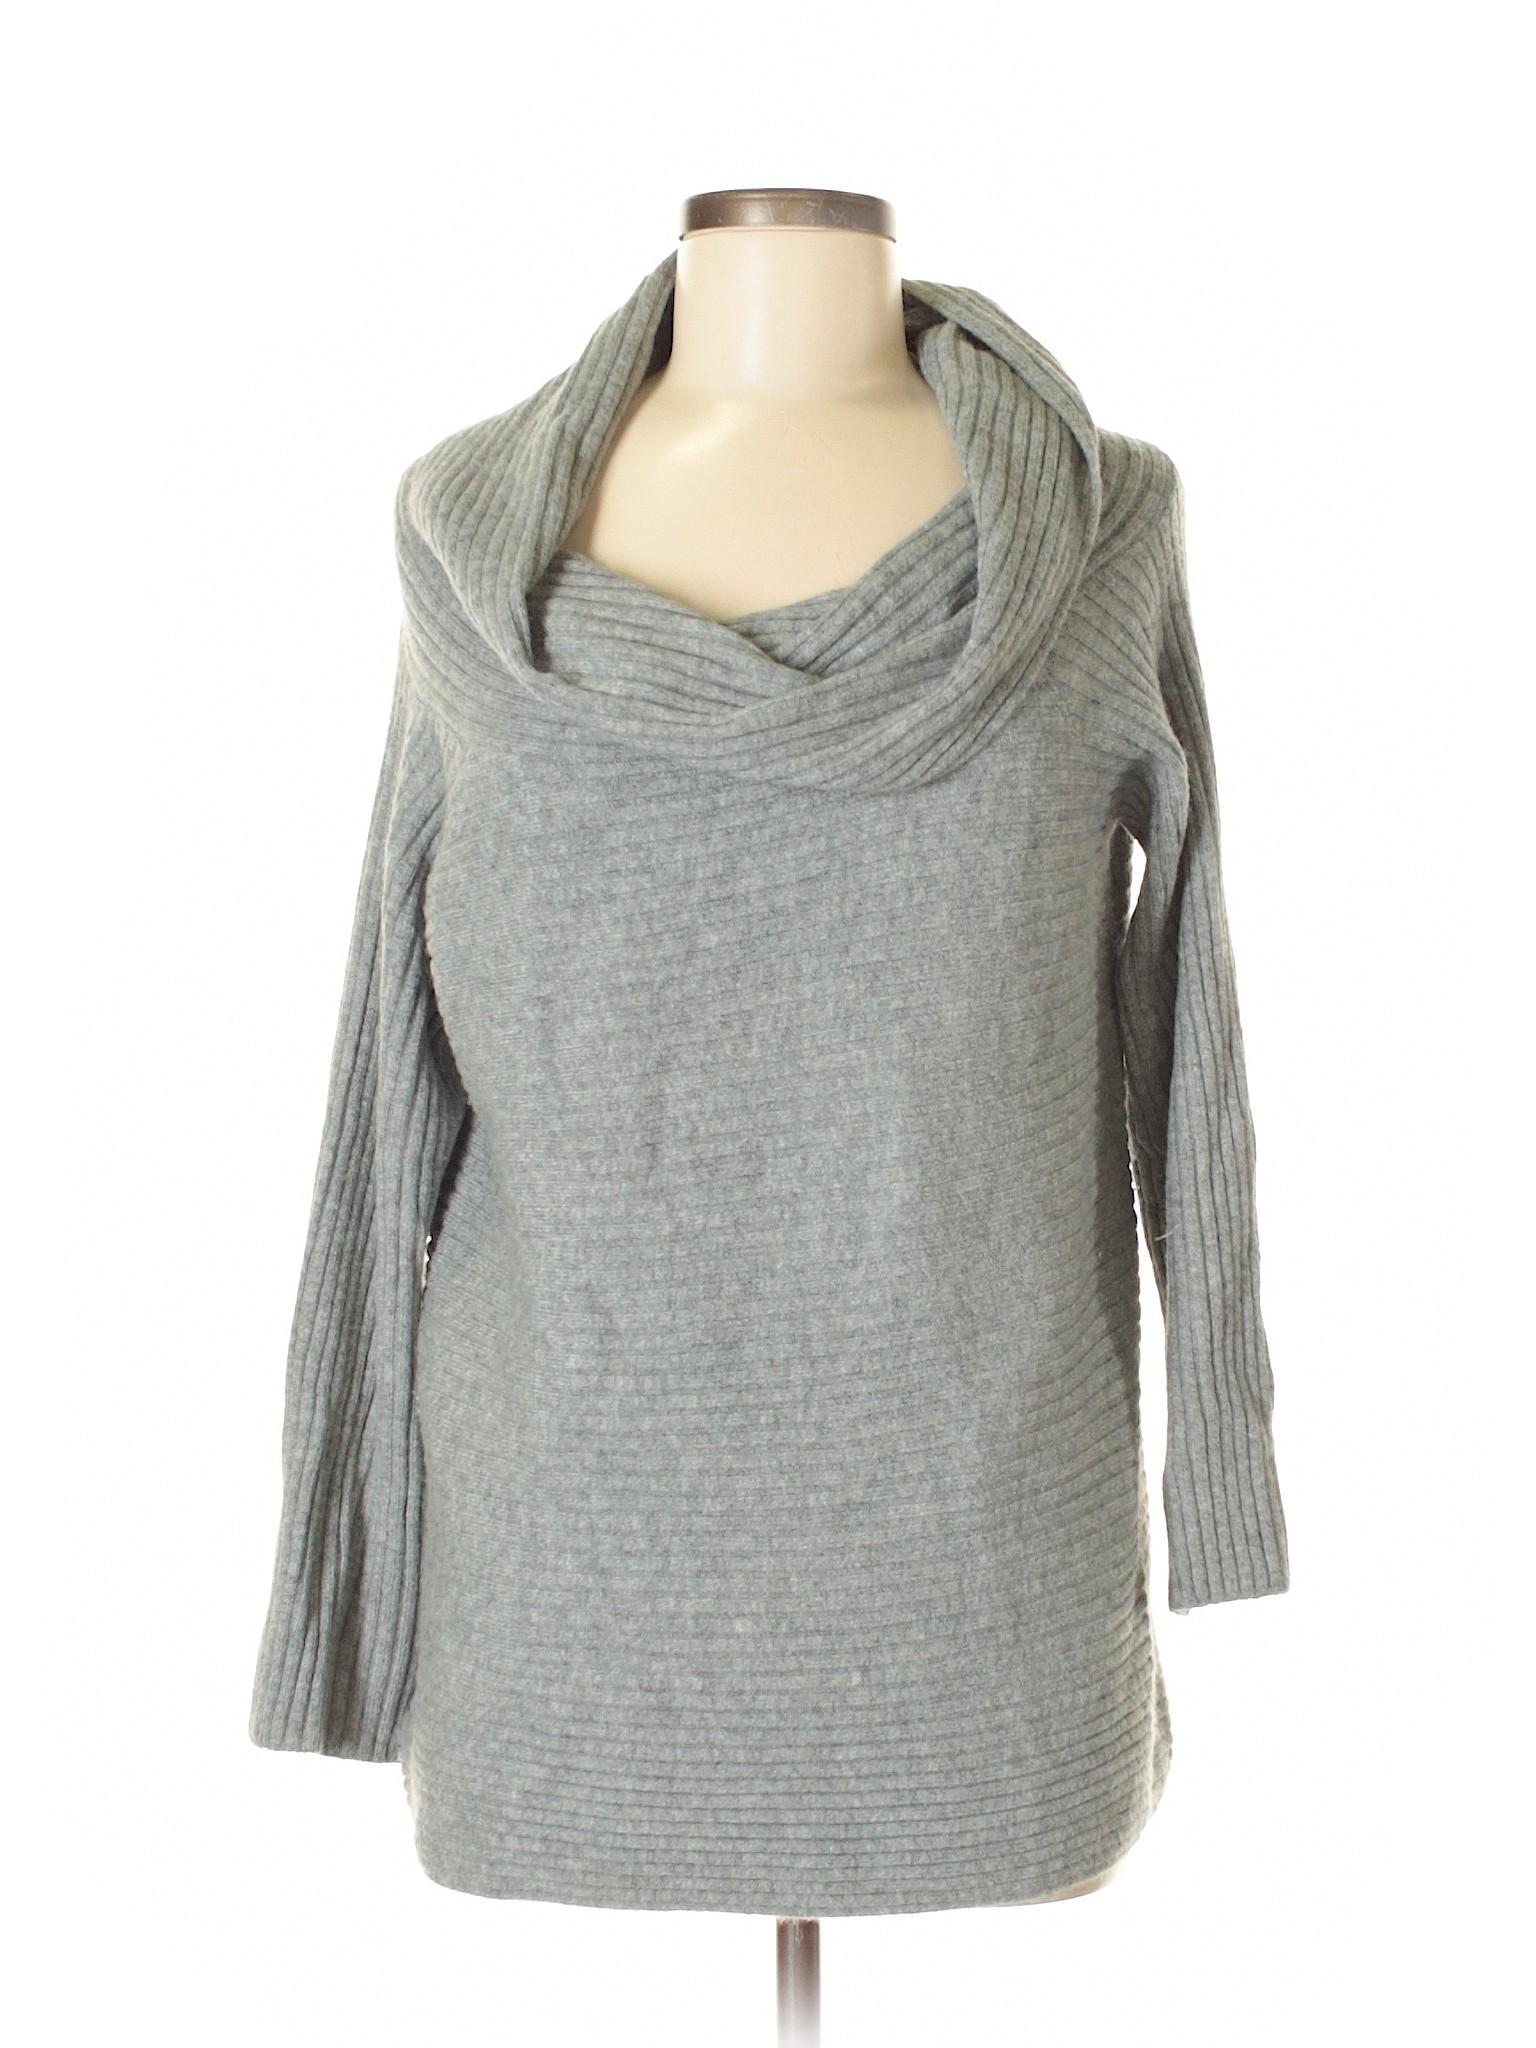 amp; Lou Boutique Grey Pullover Sweater q15pfx5w